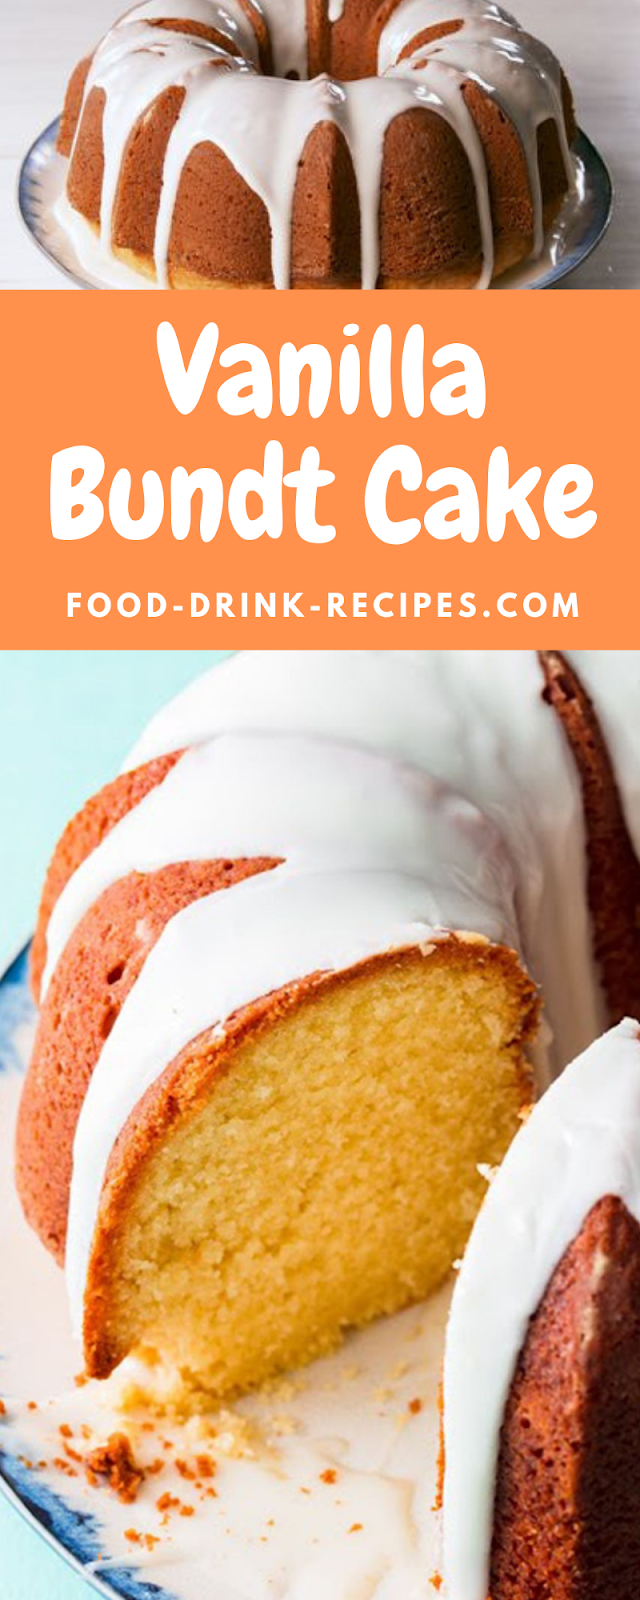 Vanilla Bundt Cake - food-drink-recipes.com